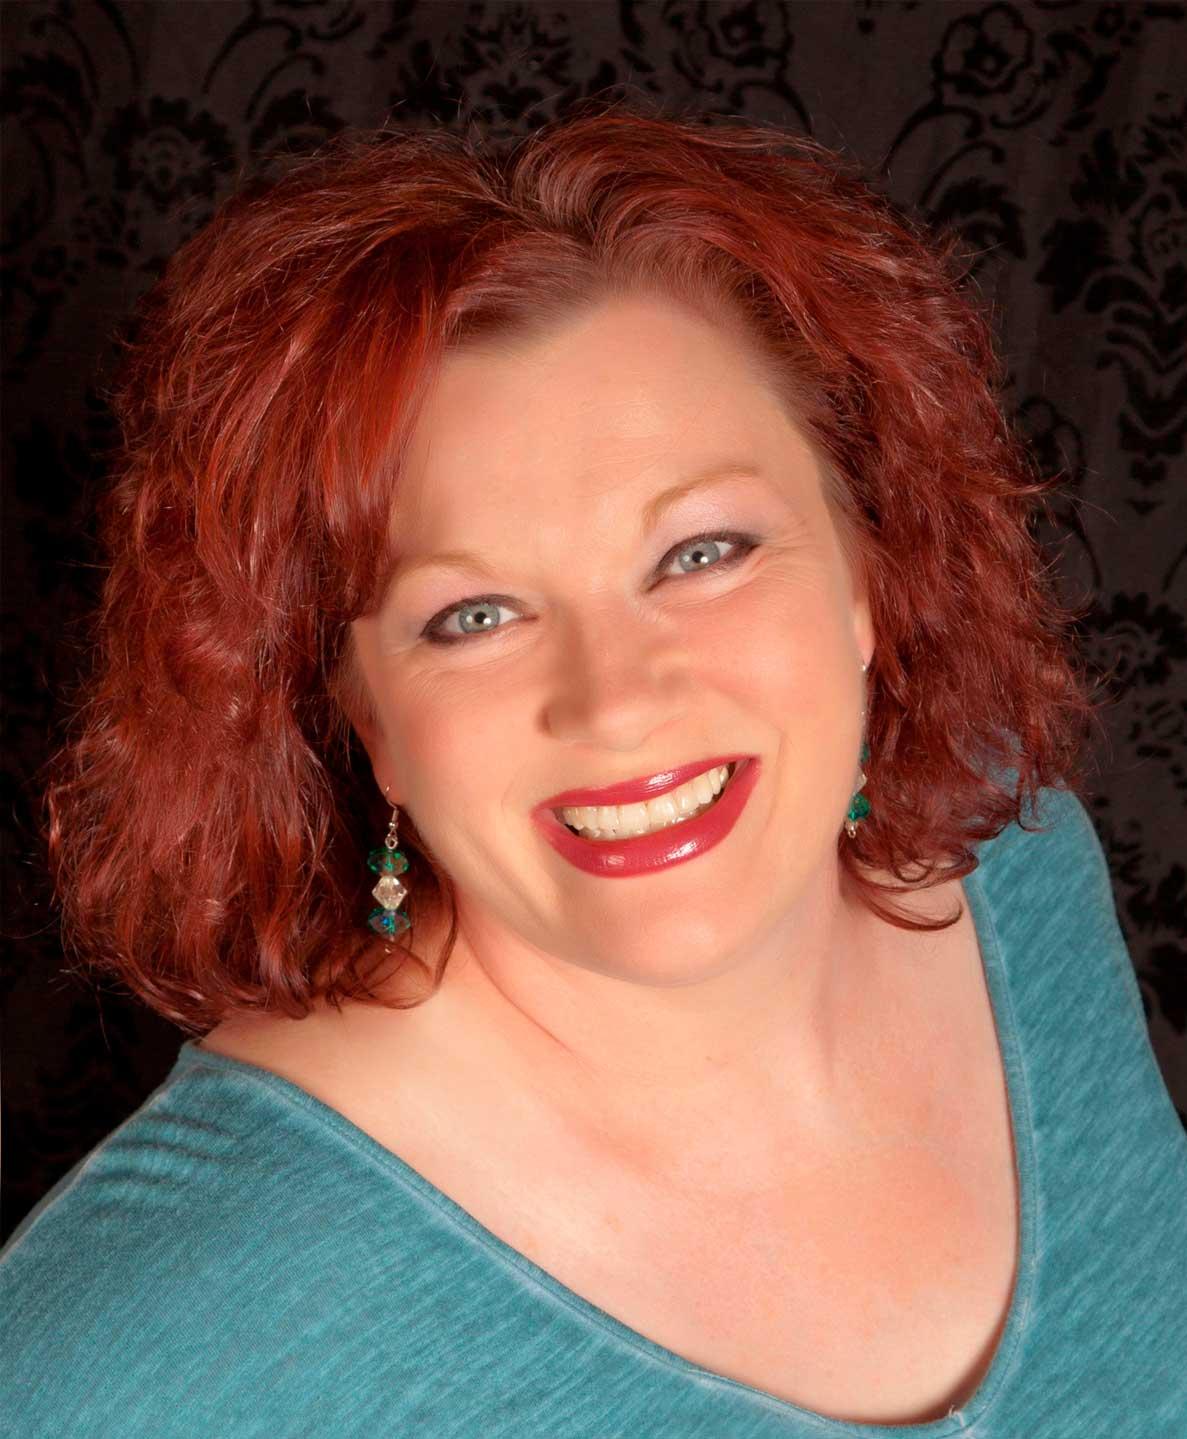 Rosemary Cundiff-Brown